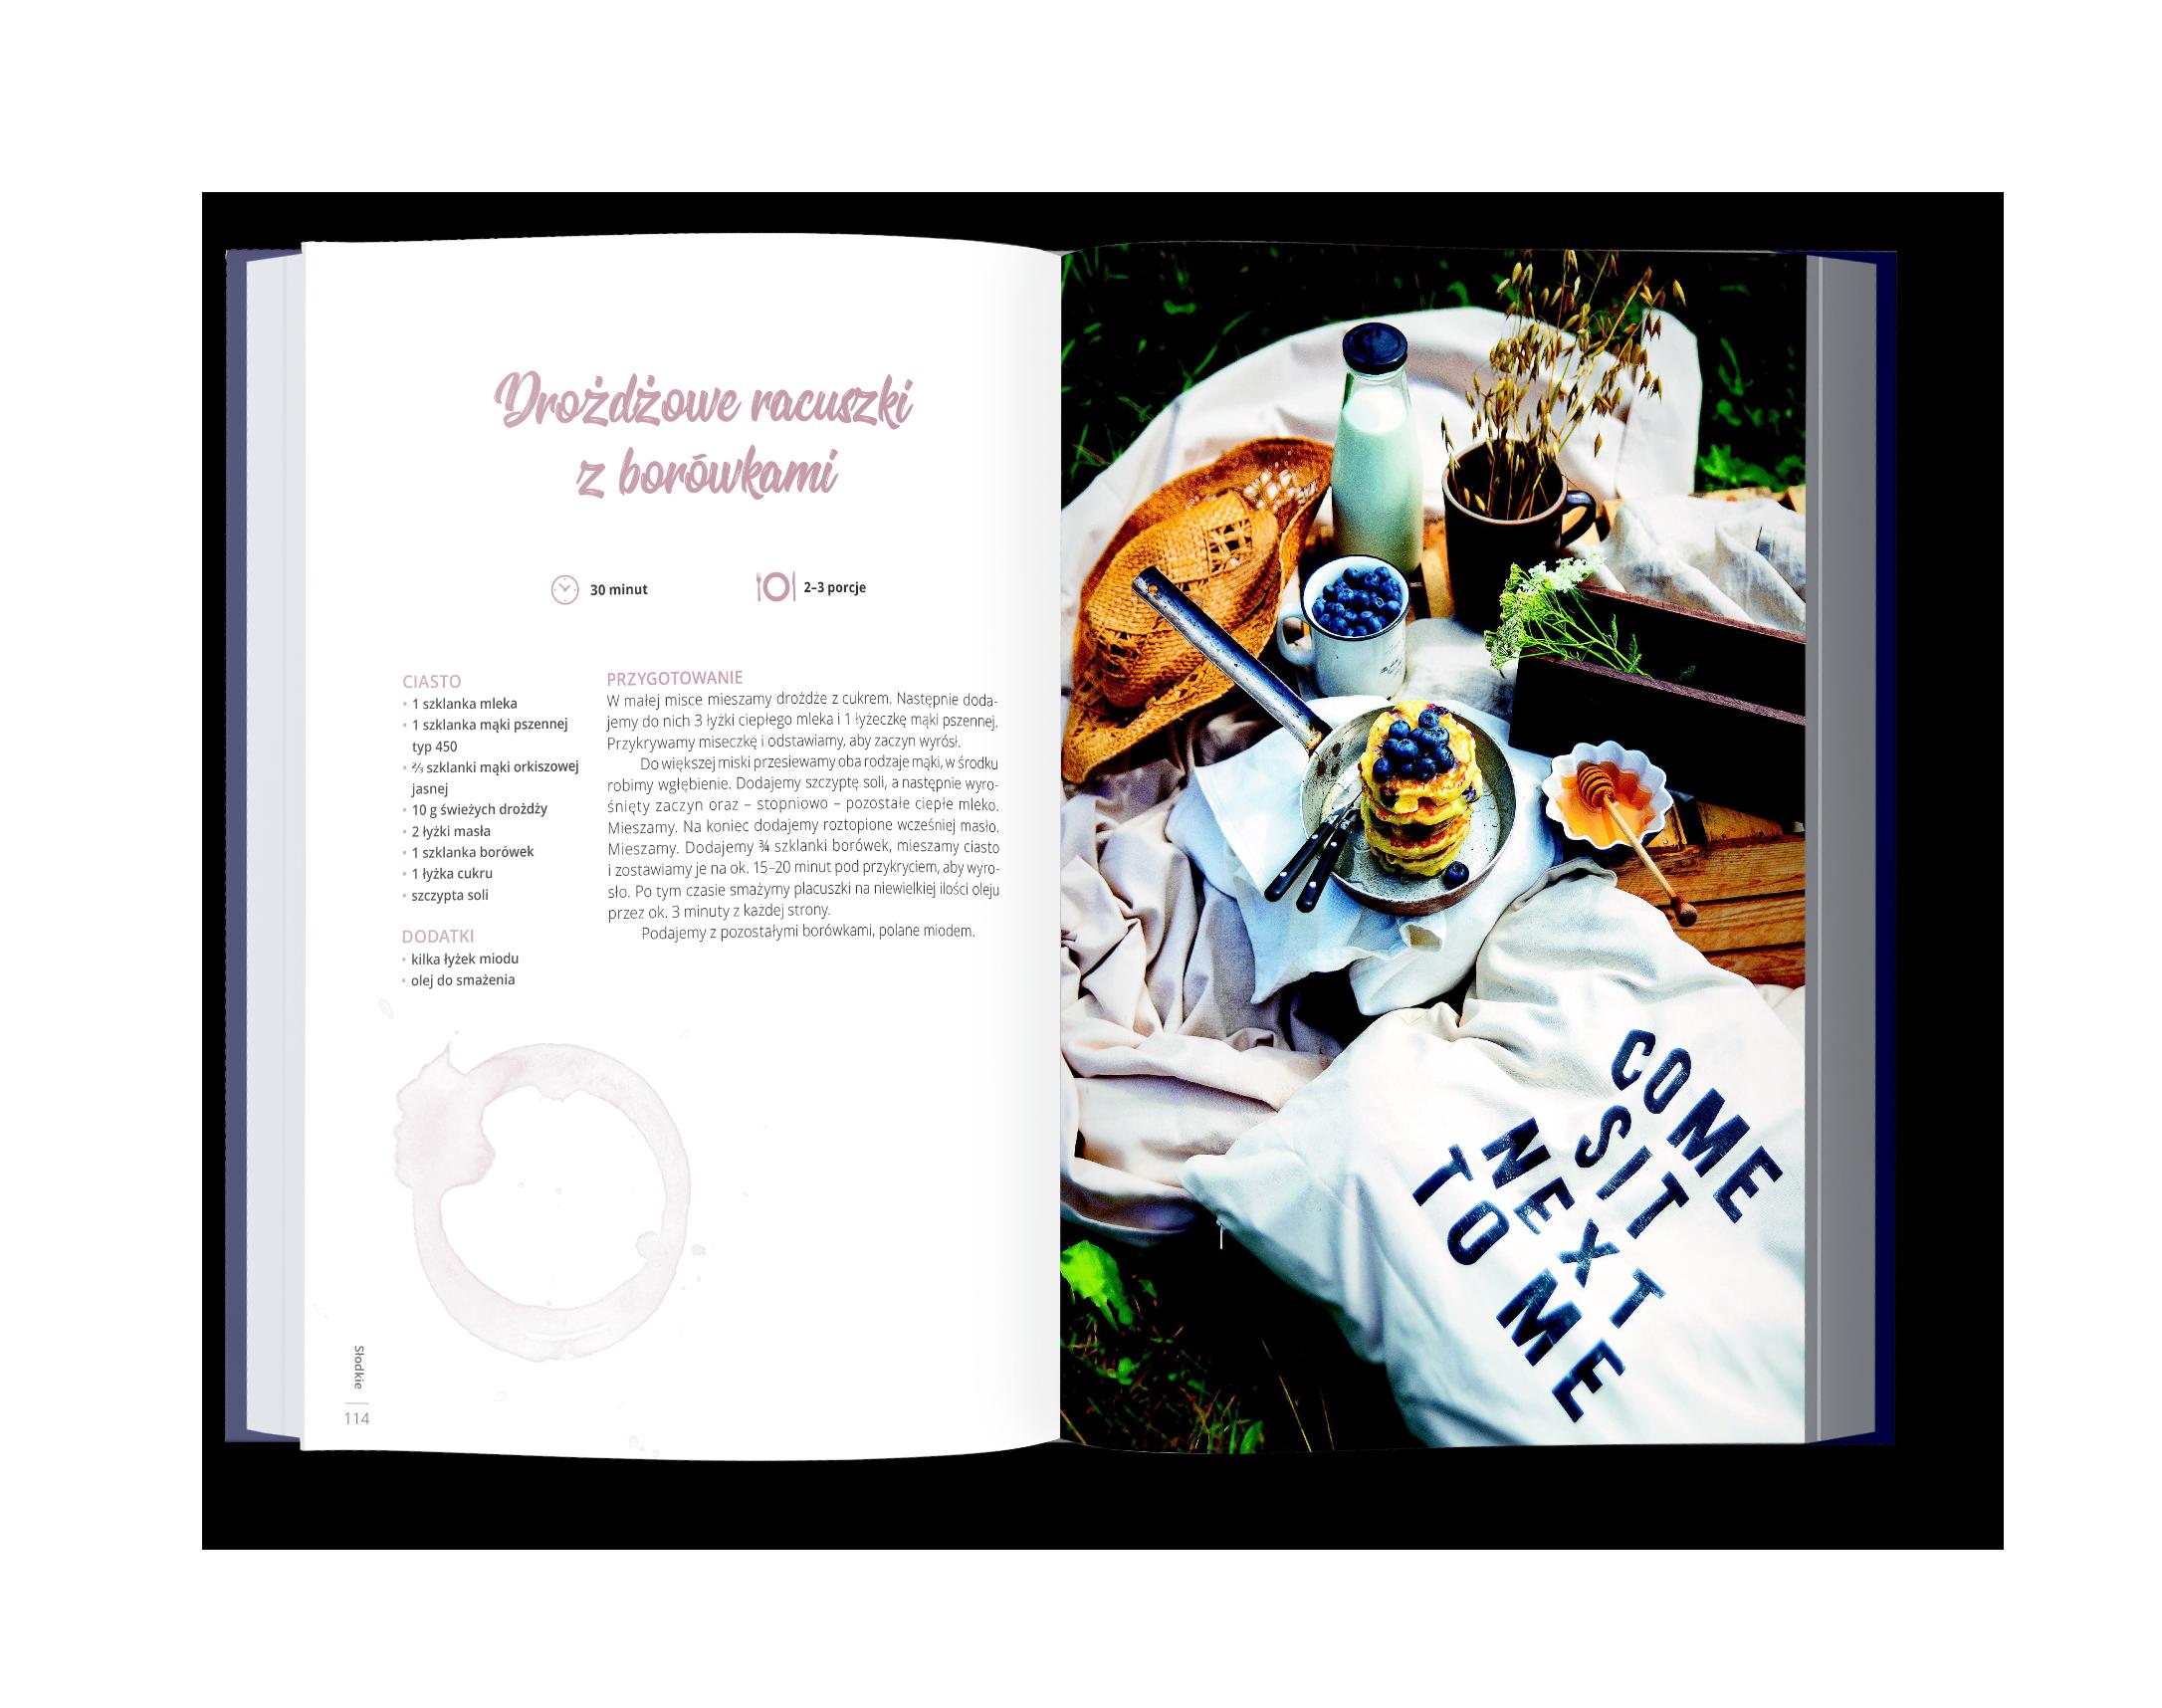 Placki niebanalnie - książka kulinarna